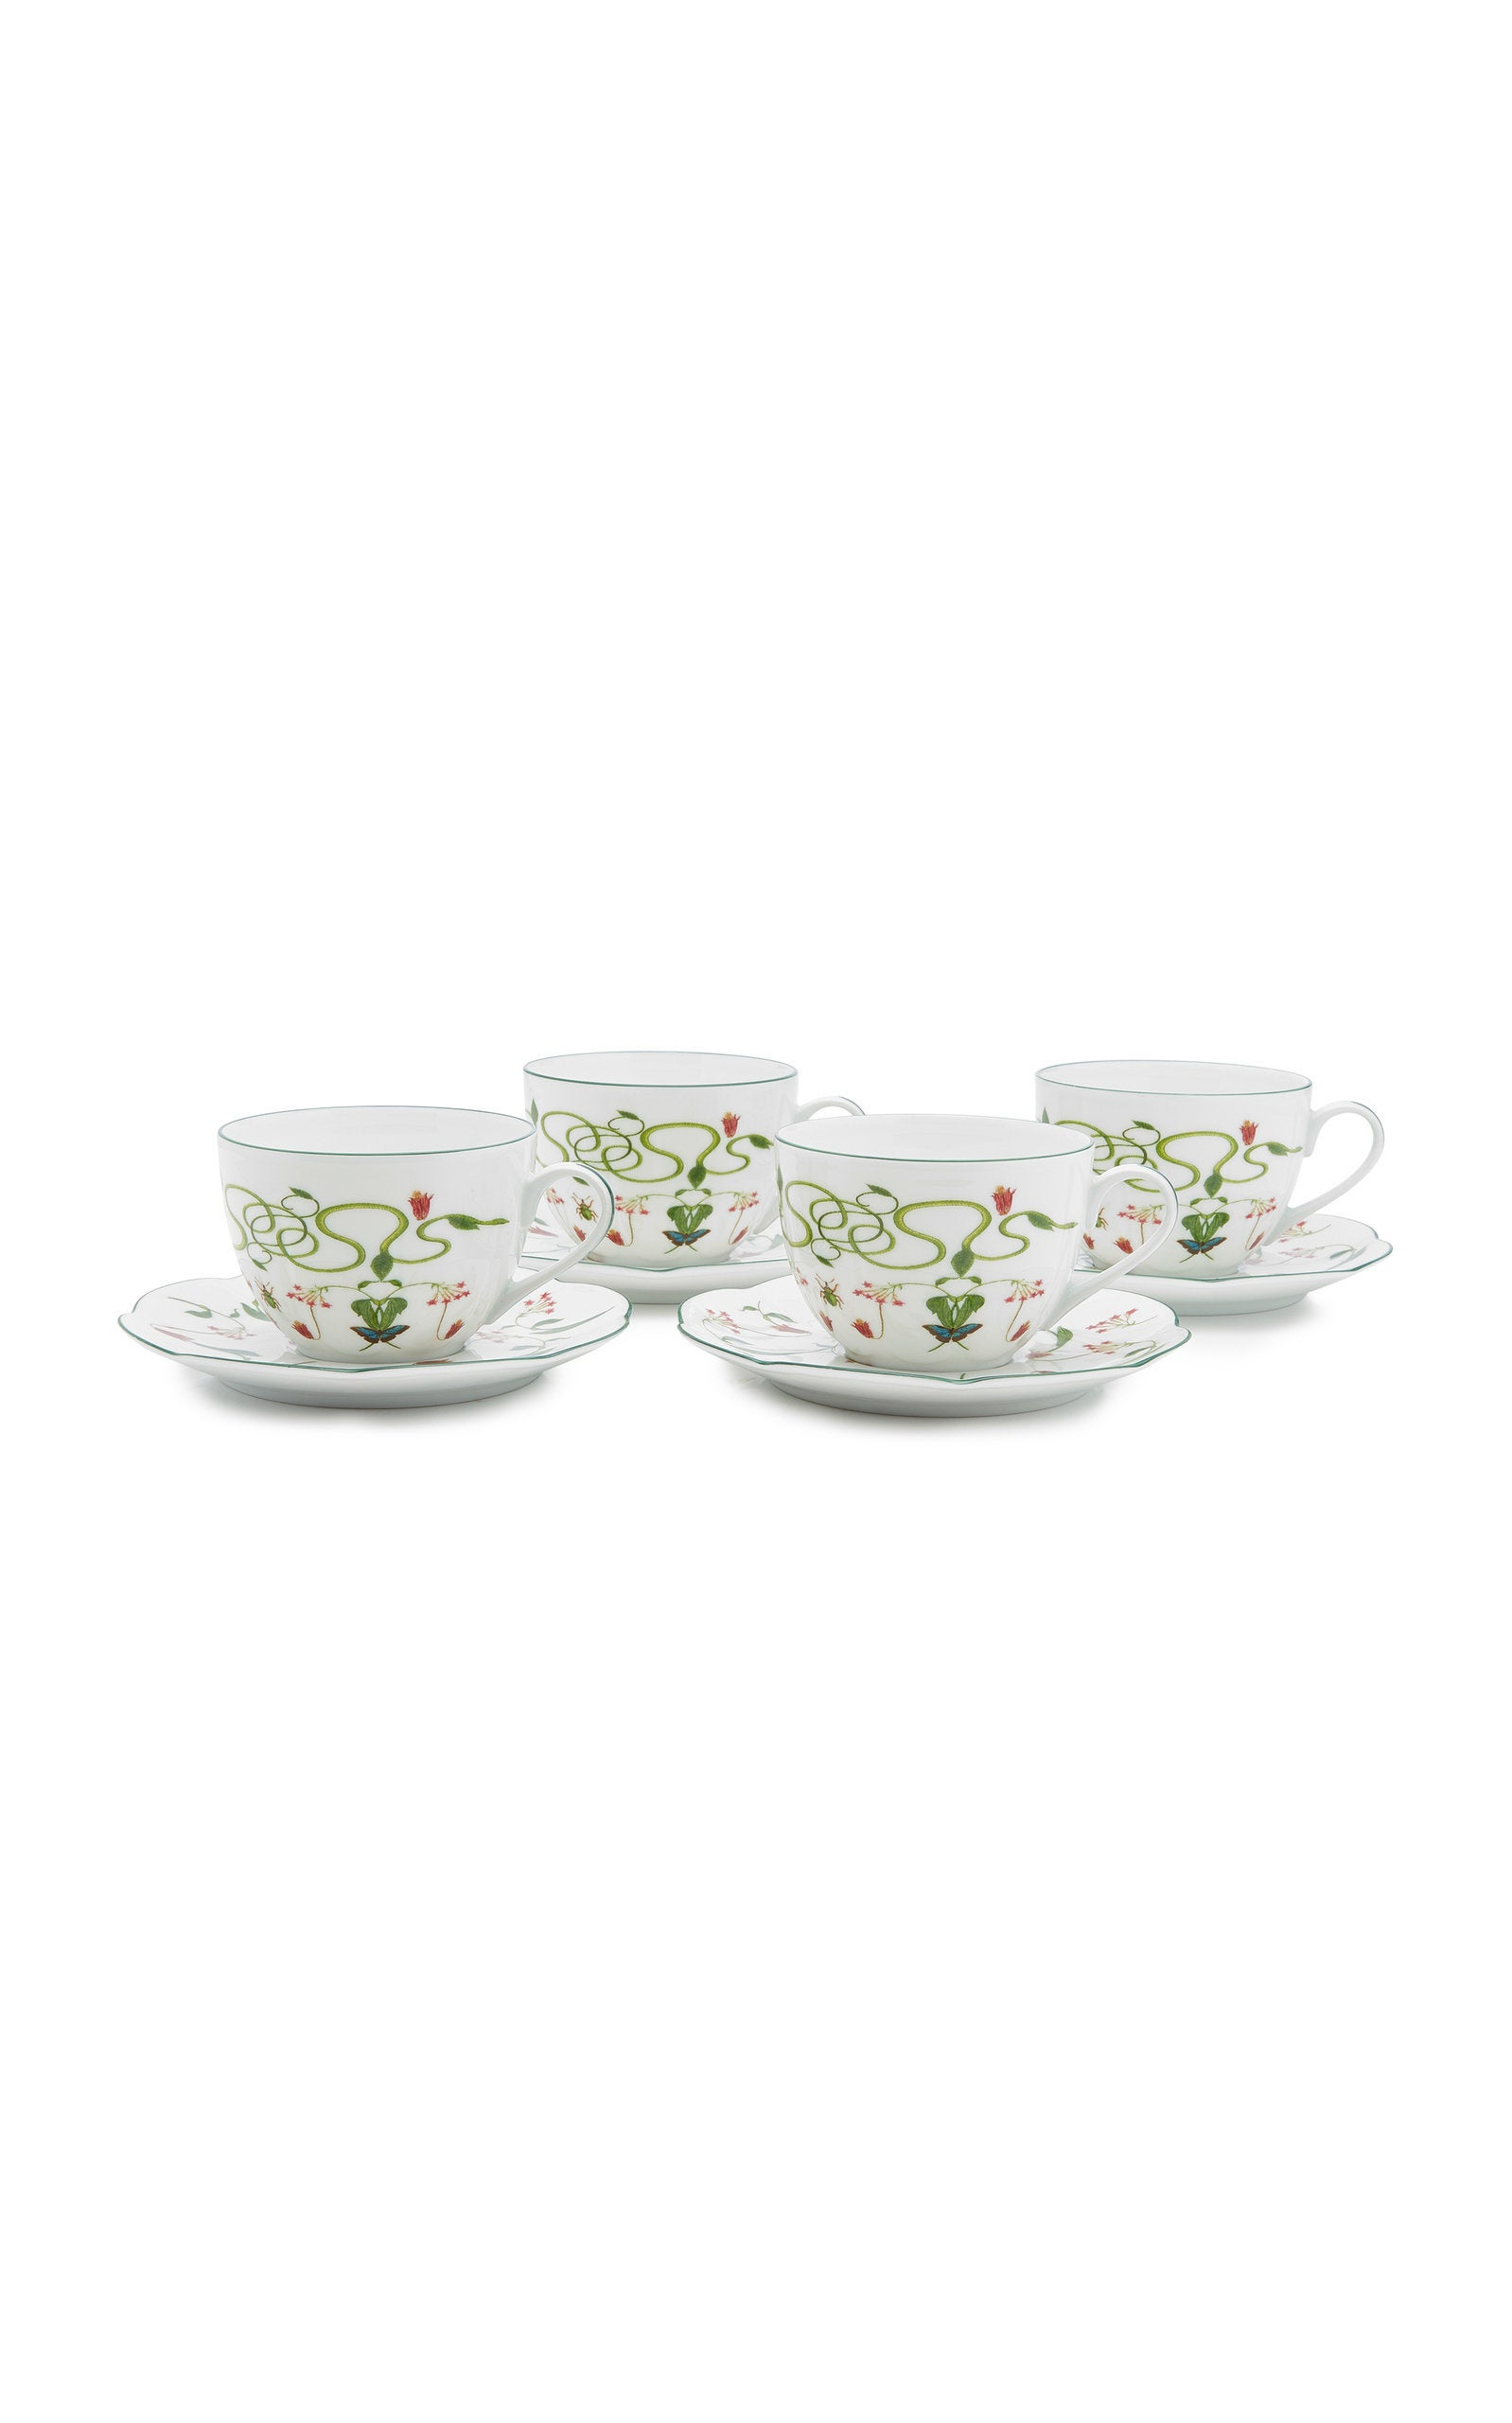 large_stephanie-fishwick-white-set-of-four-porcelain-teacup-and-saucer-set